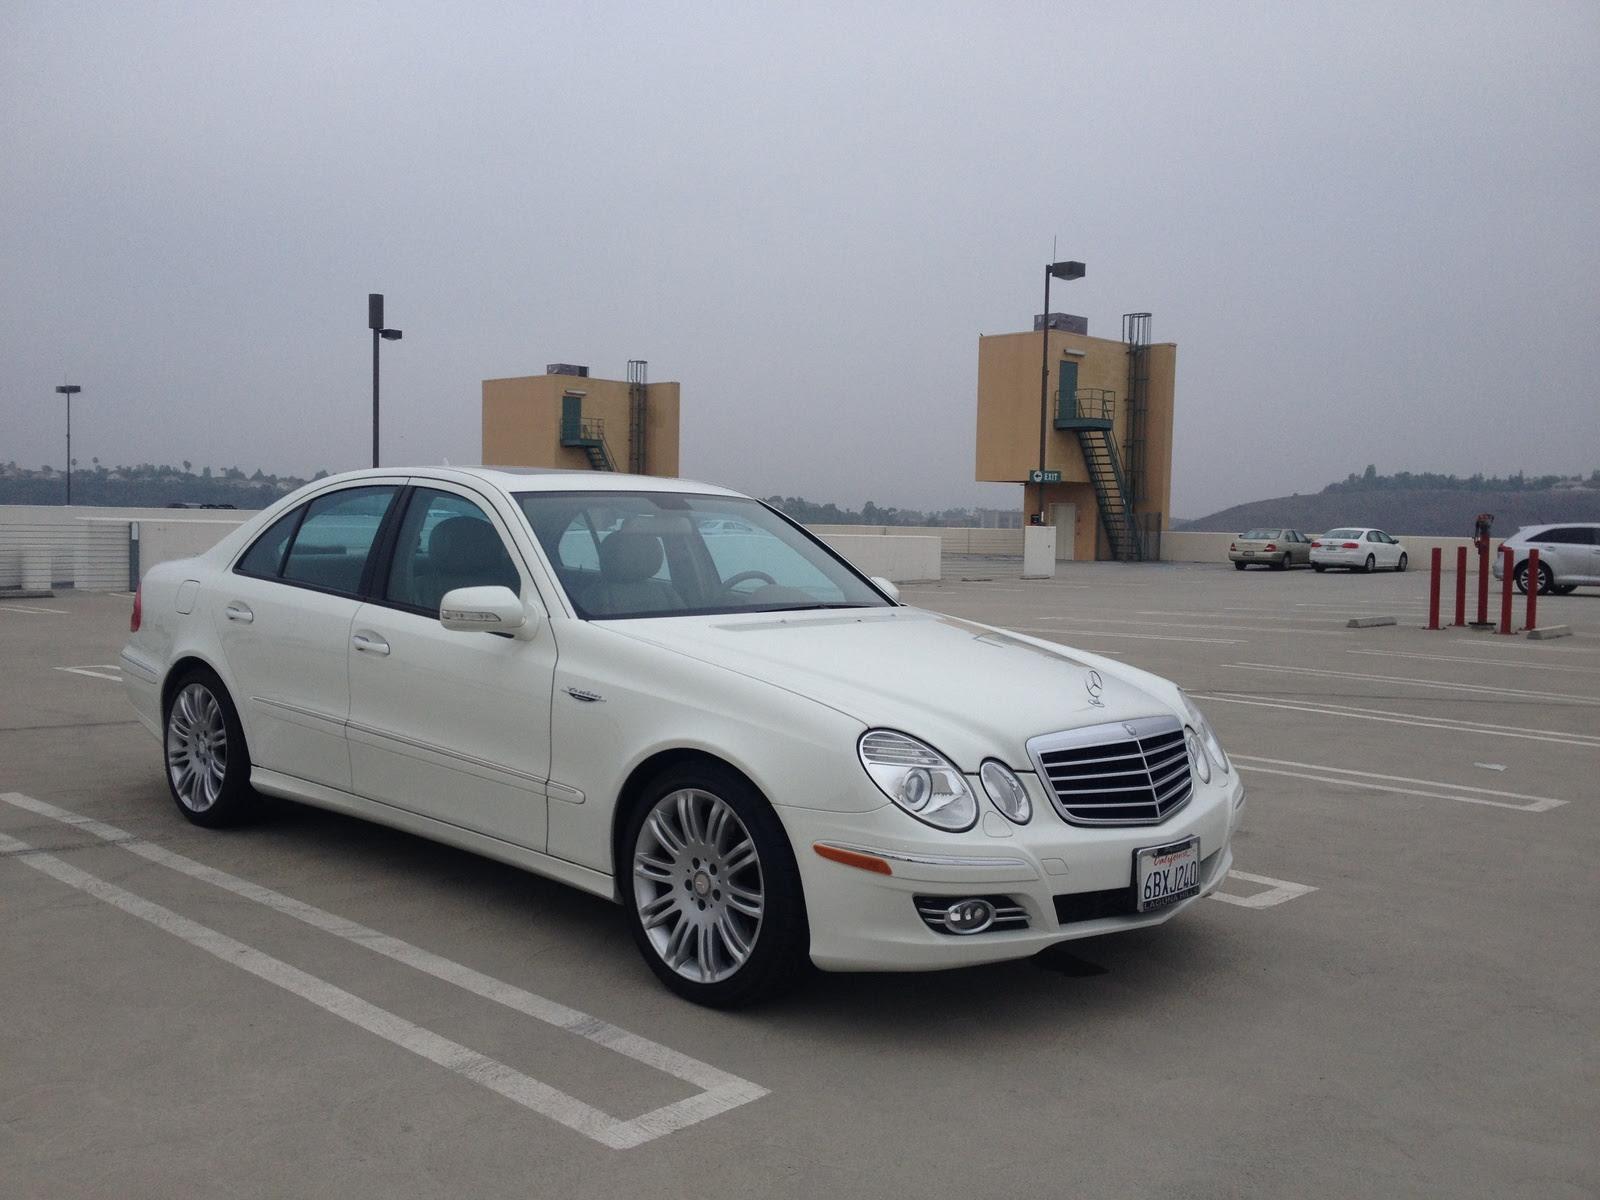 2008 Mercedes-Benz E-Class - Pictures - CarGurus